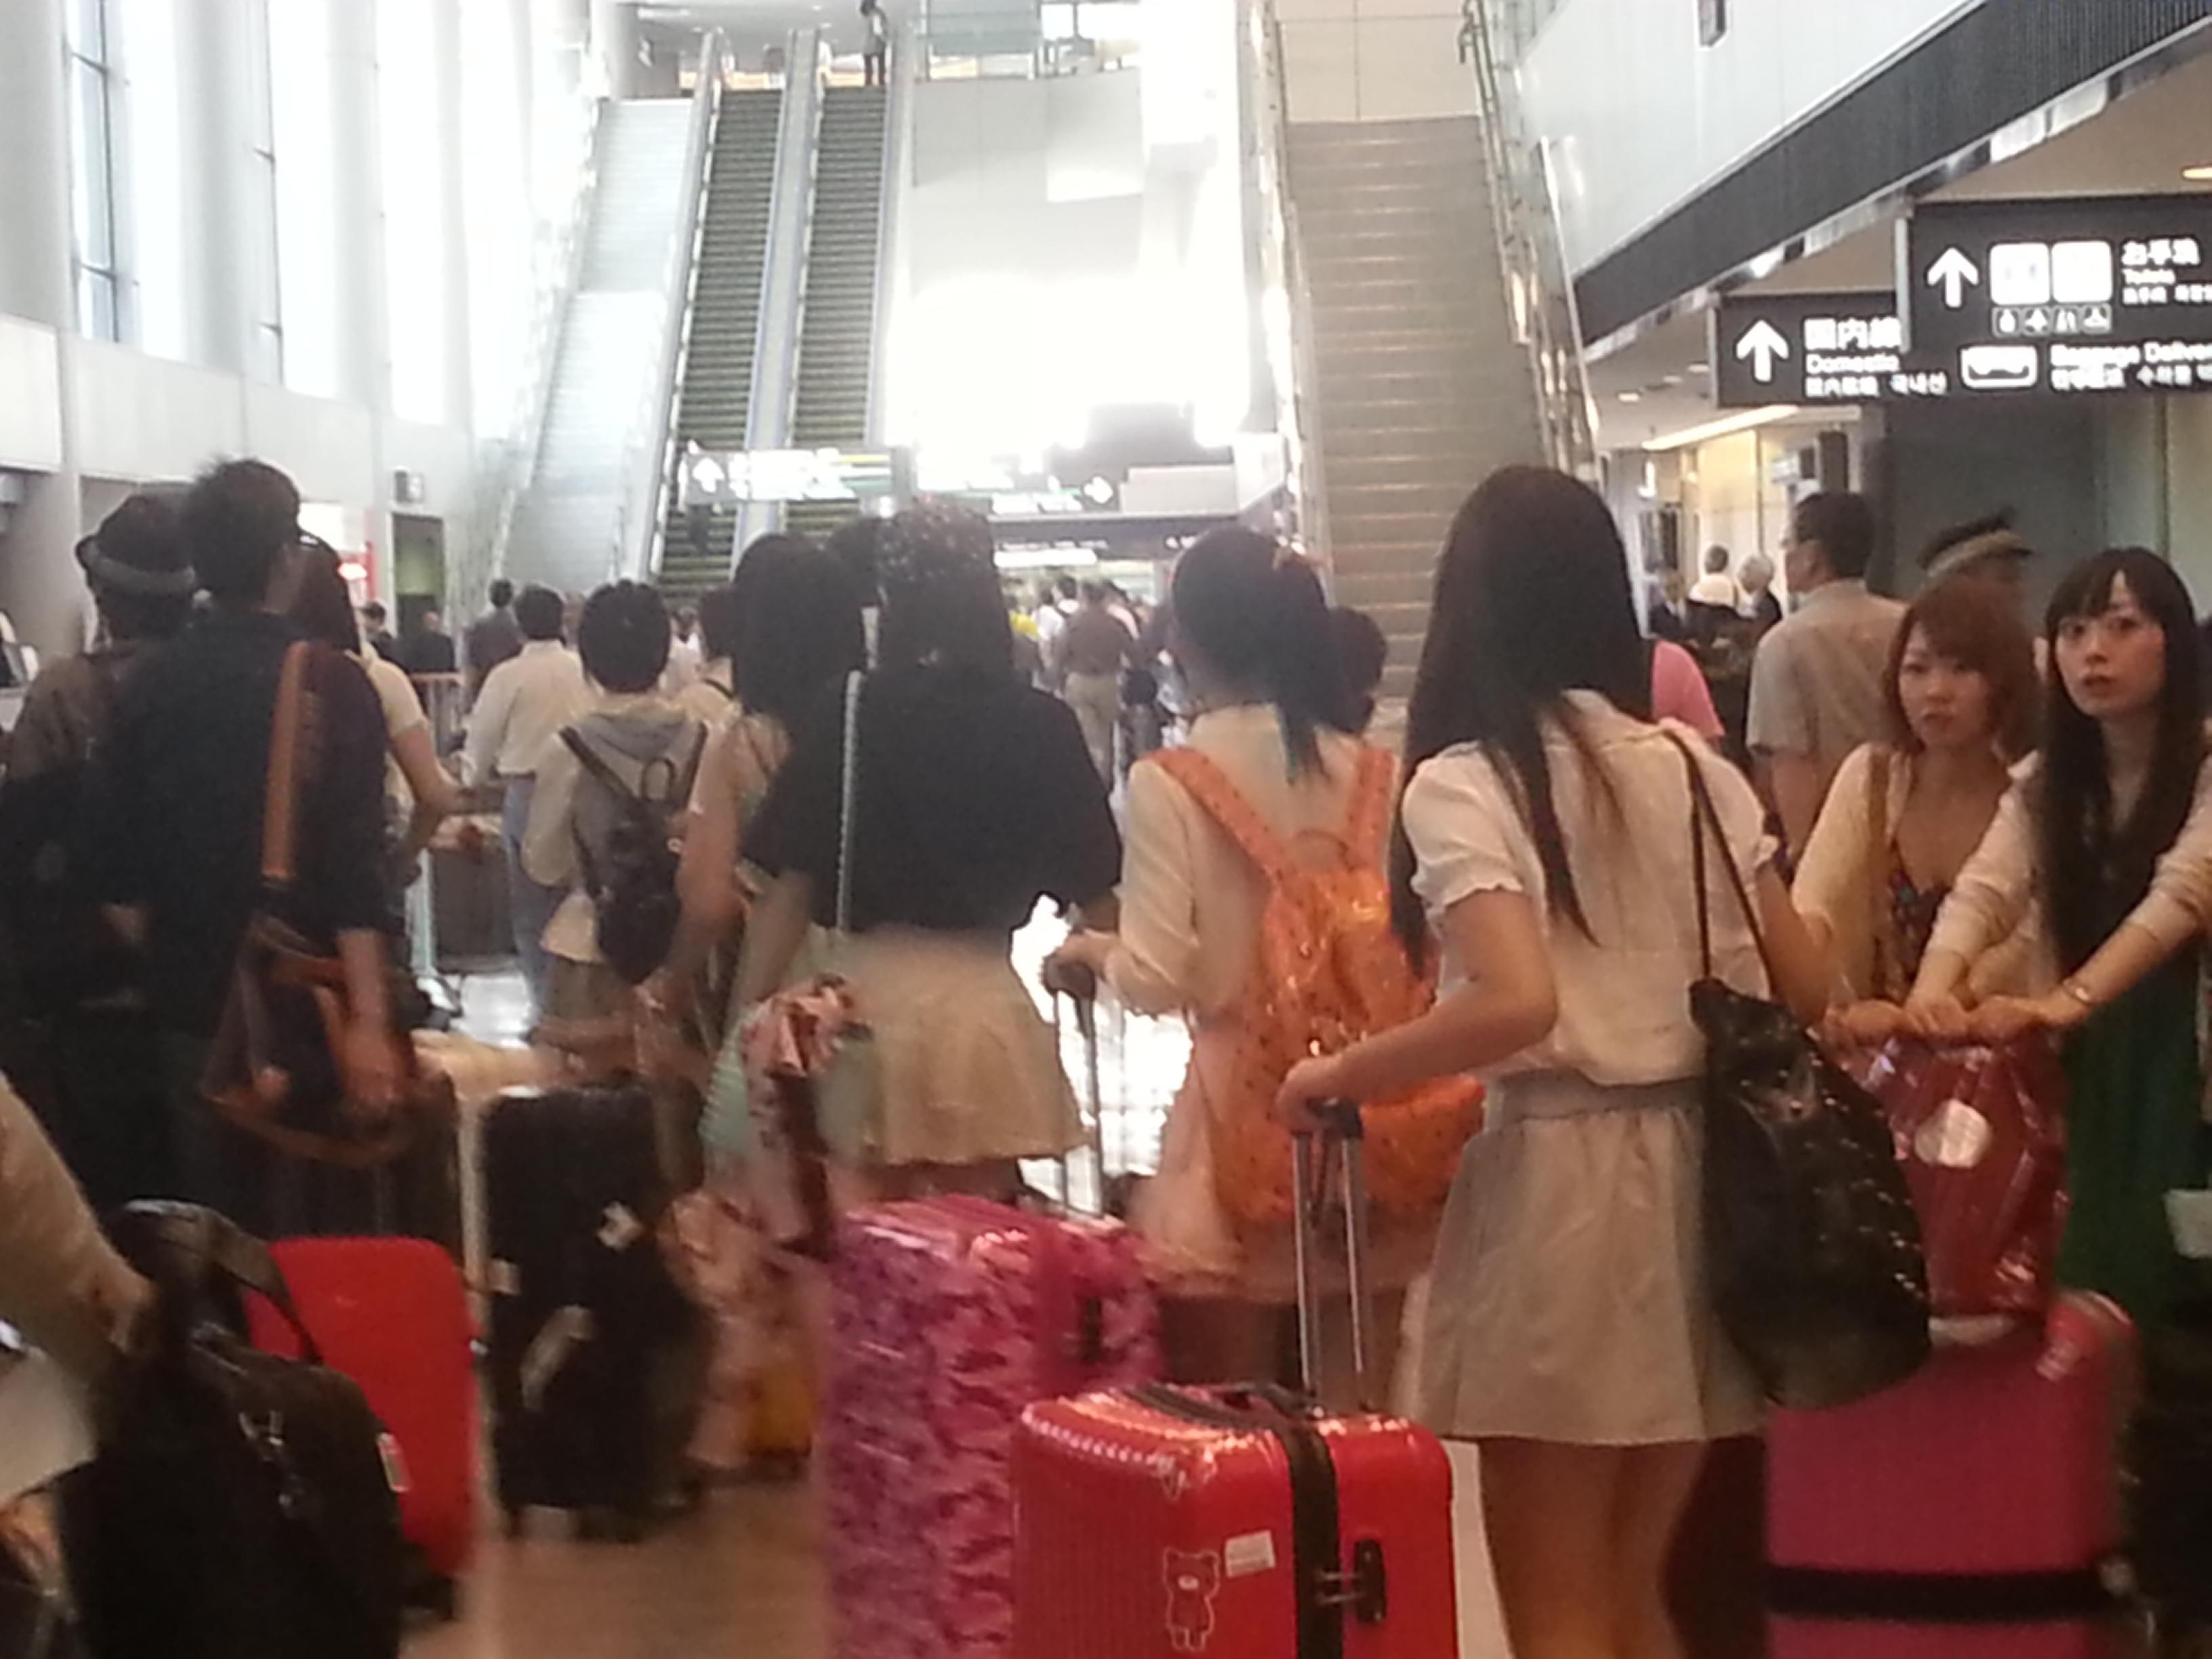 【SNH48】AKB48総選挙に6人のメンバーが来日決定!6月6日到着便予想(笑)